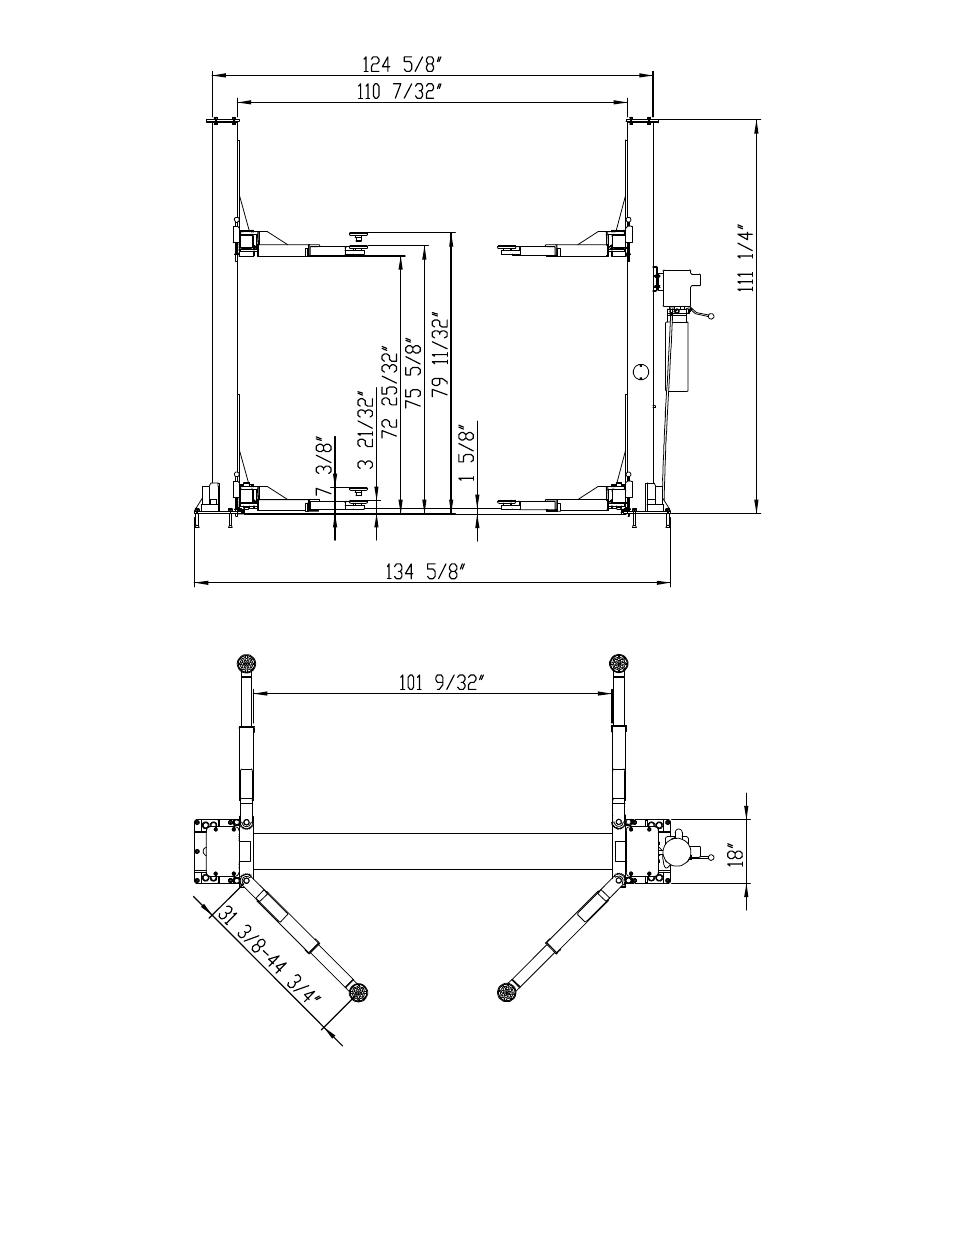 Auto Lift Wiring Diagram Trusted Schematics 2010 Gmc Radio Rotary Schematic Diagrams